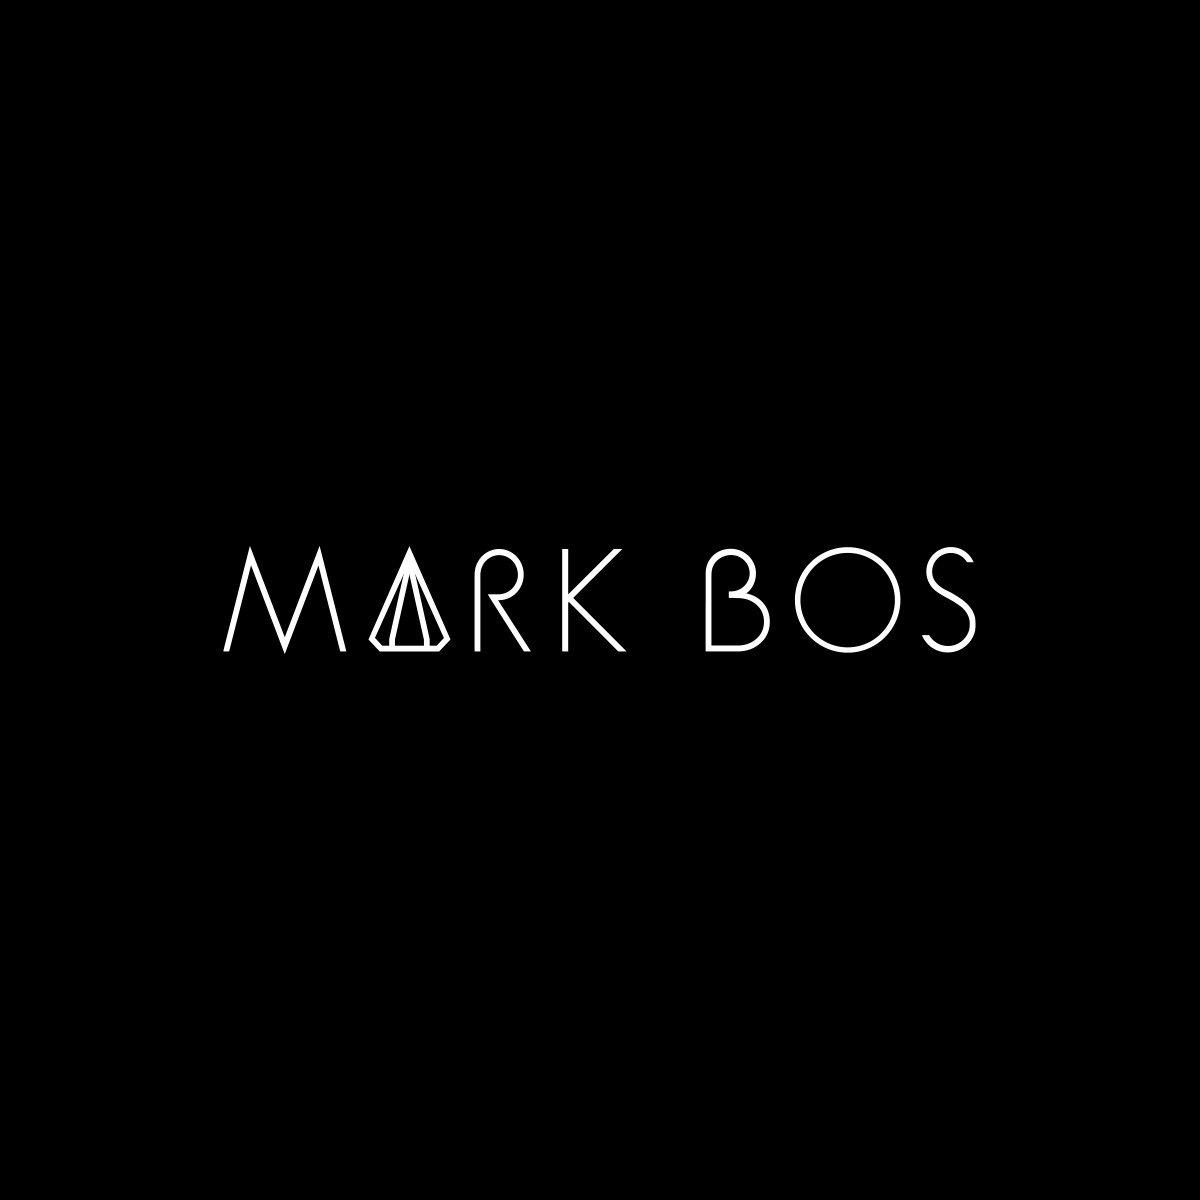 Mark Bos Logo